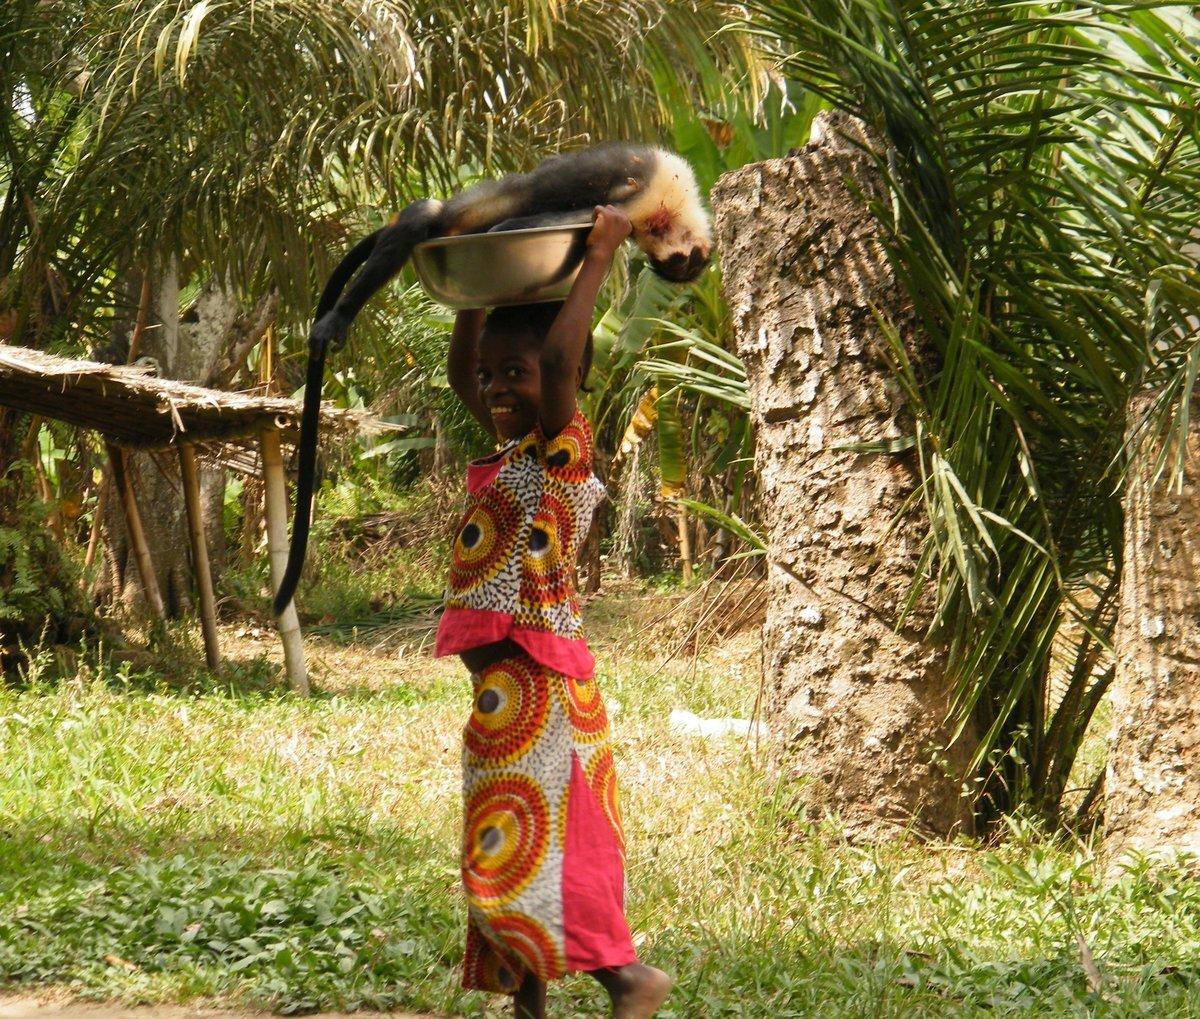 Reduction of bushmeat hunting